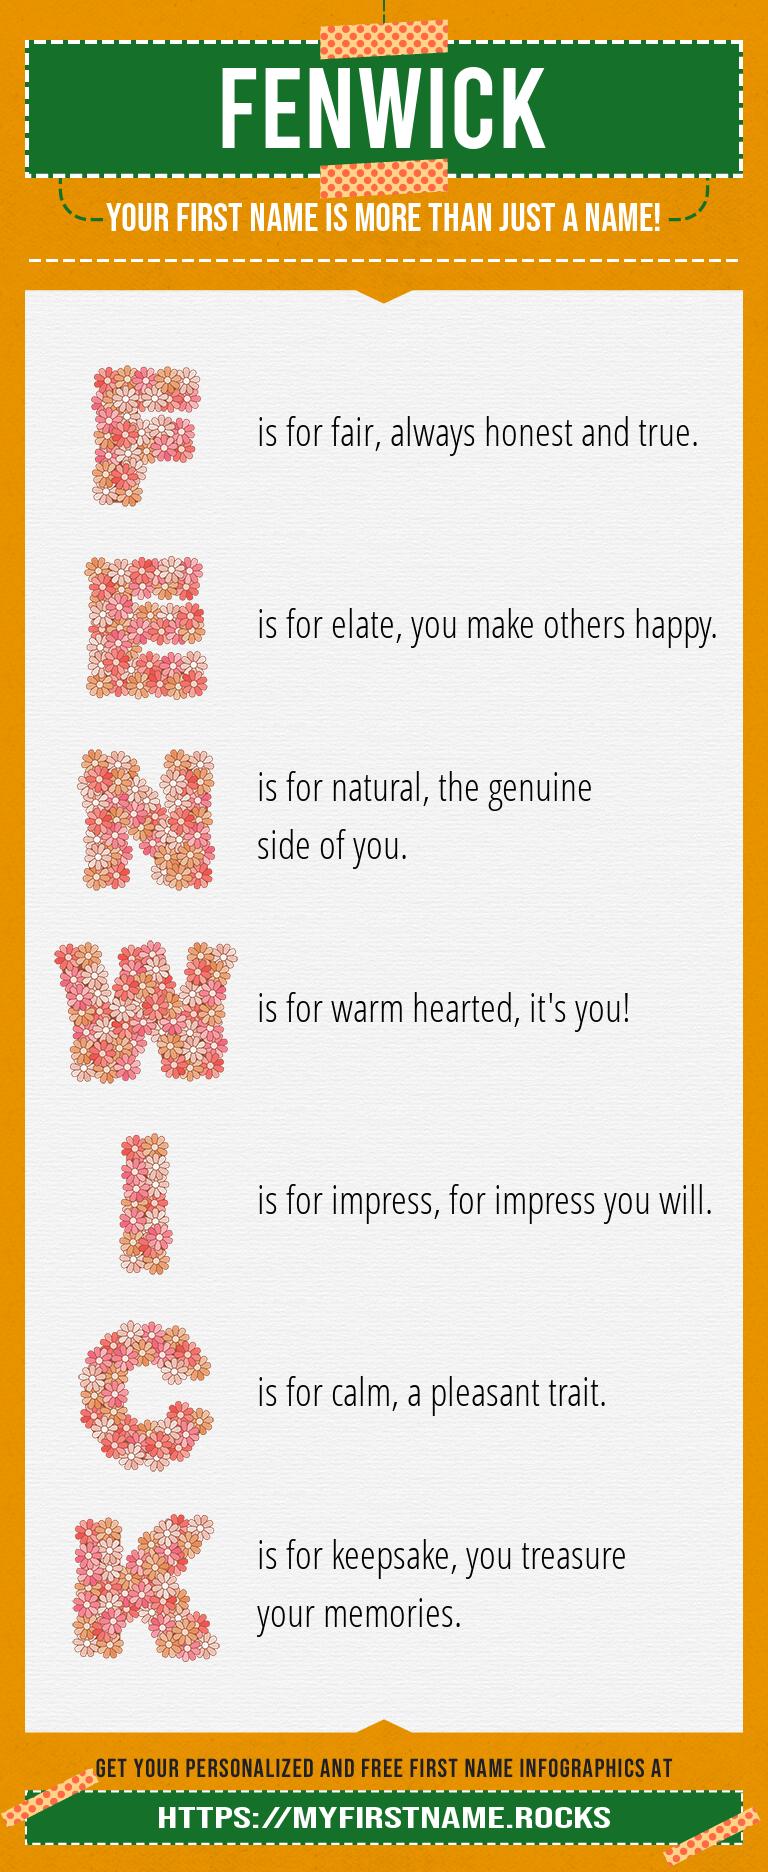 Fenwick Infographics